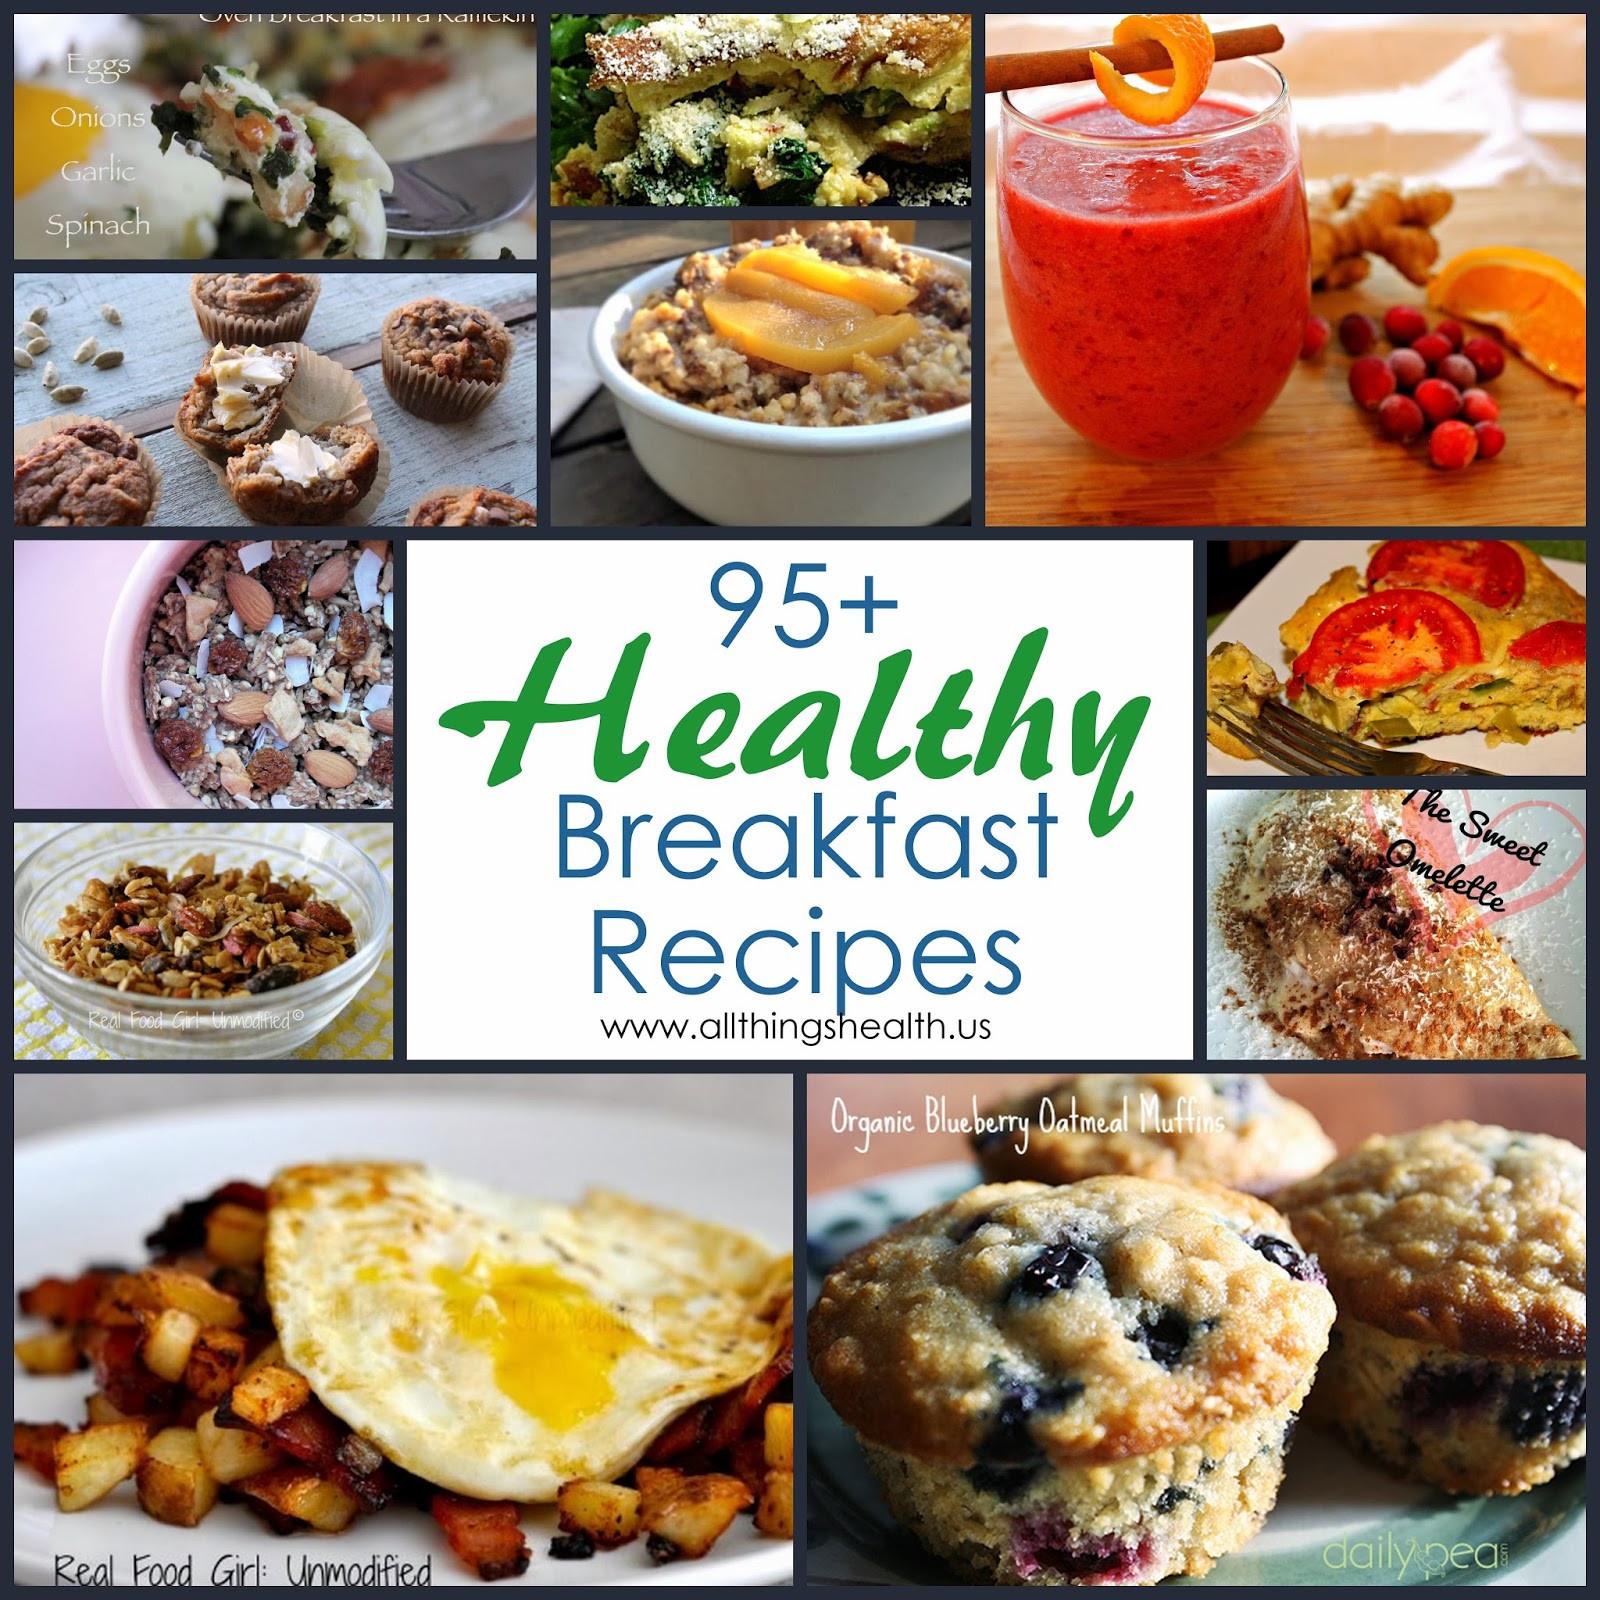 Healthy Breakfast Desserts  All Things Health 95 Healthy Breakfast Recipes